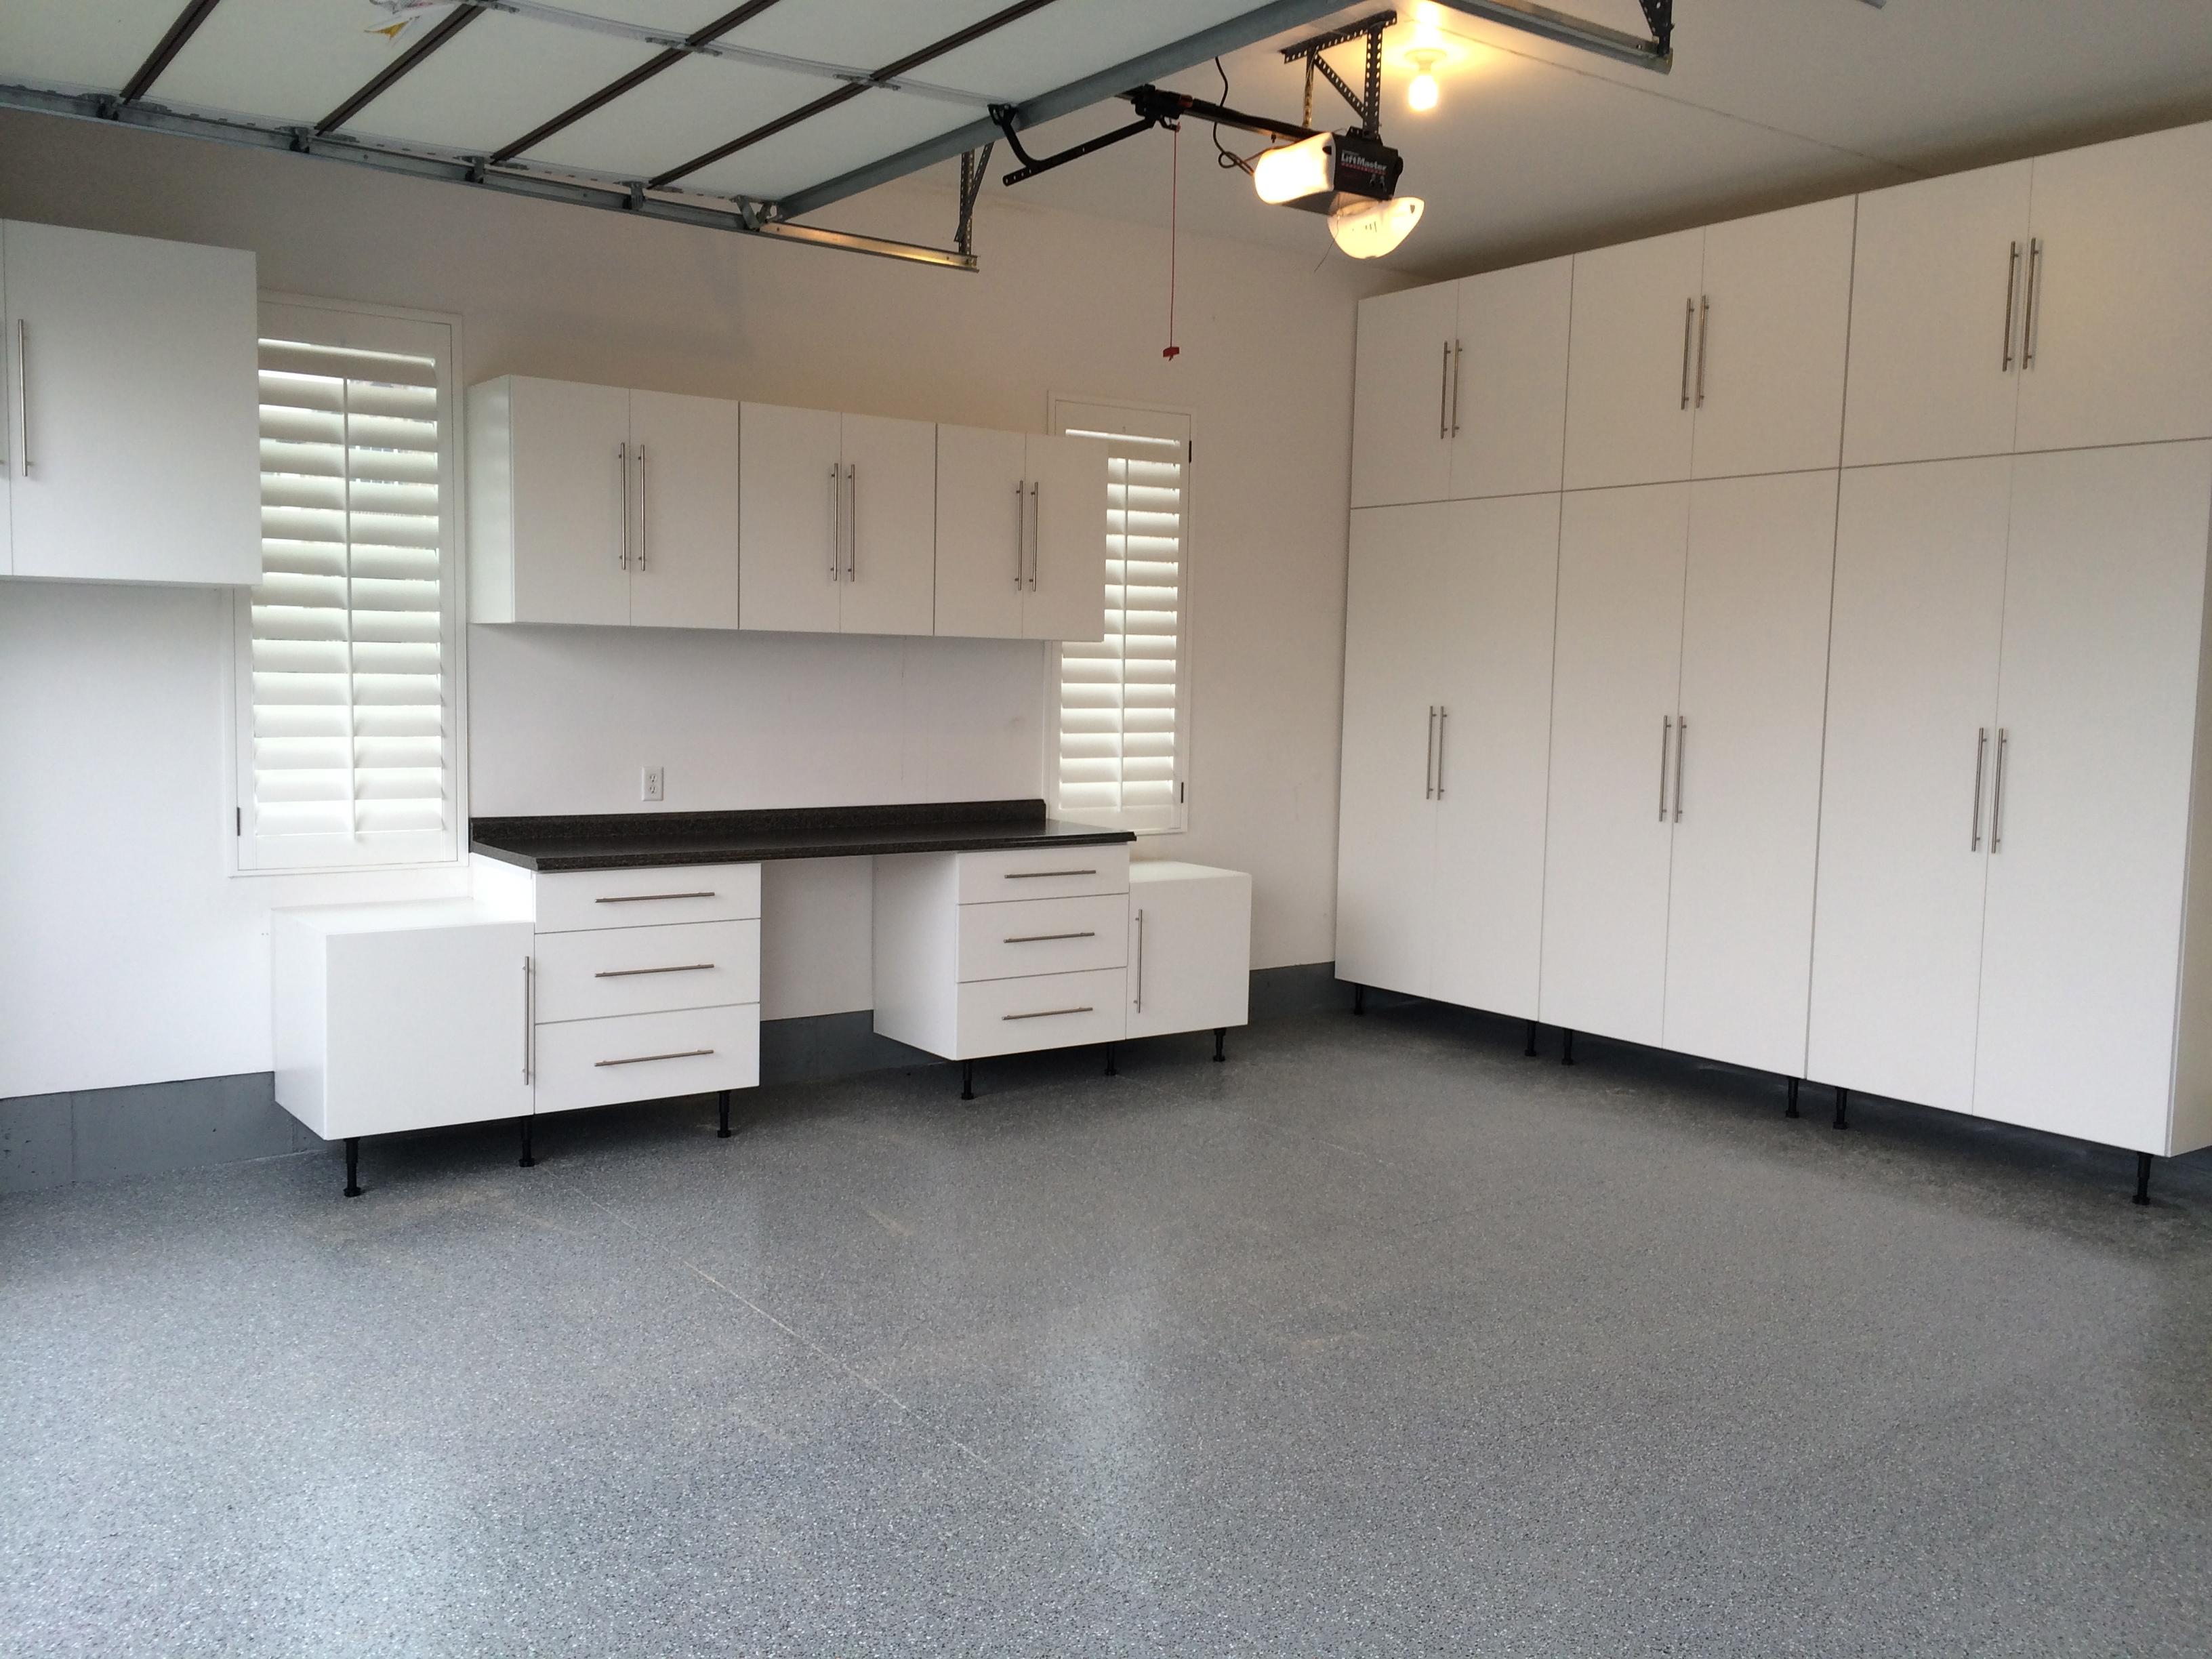 Quality Pro Epoxy Garage Floor Coating Amp Garage Cabinets